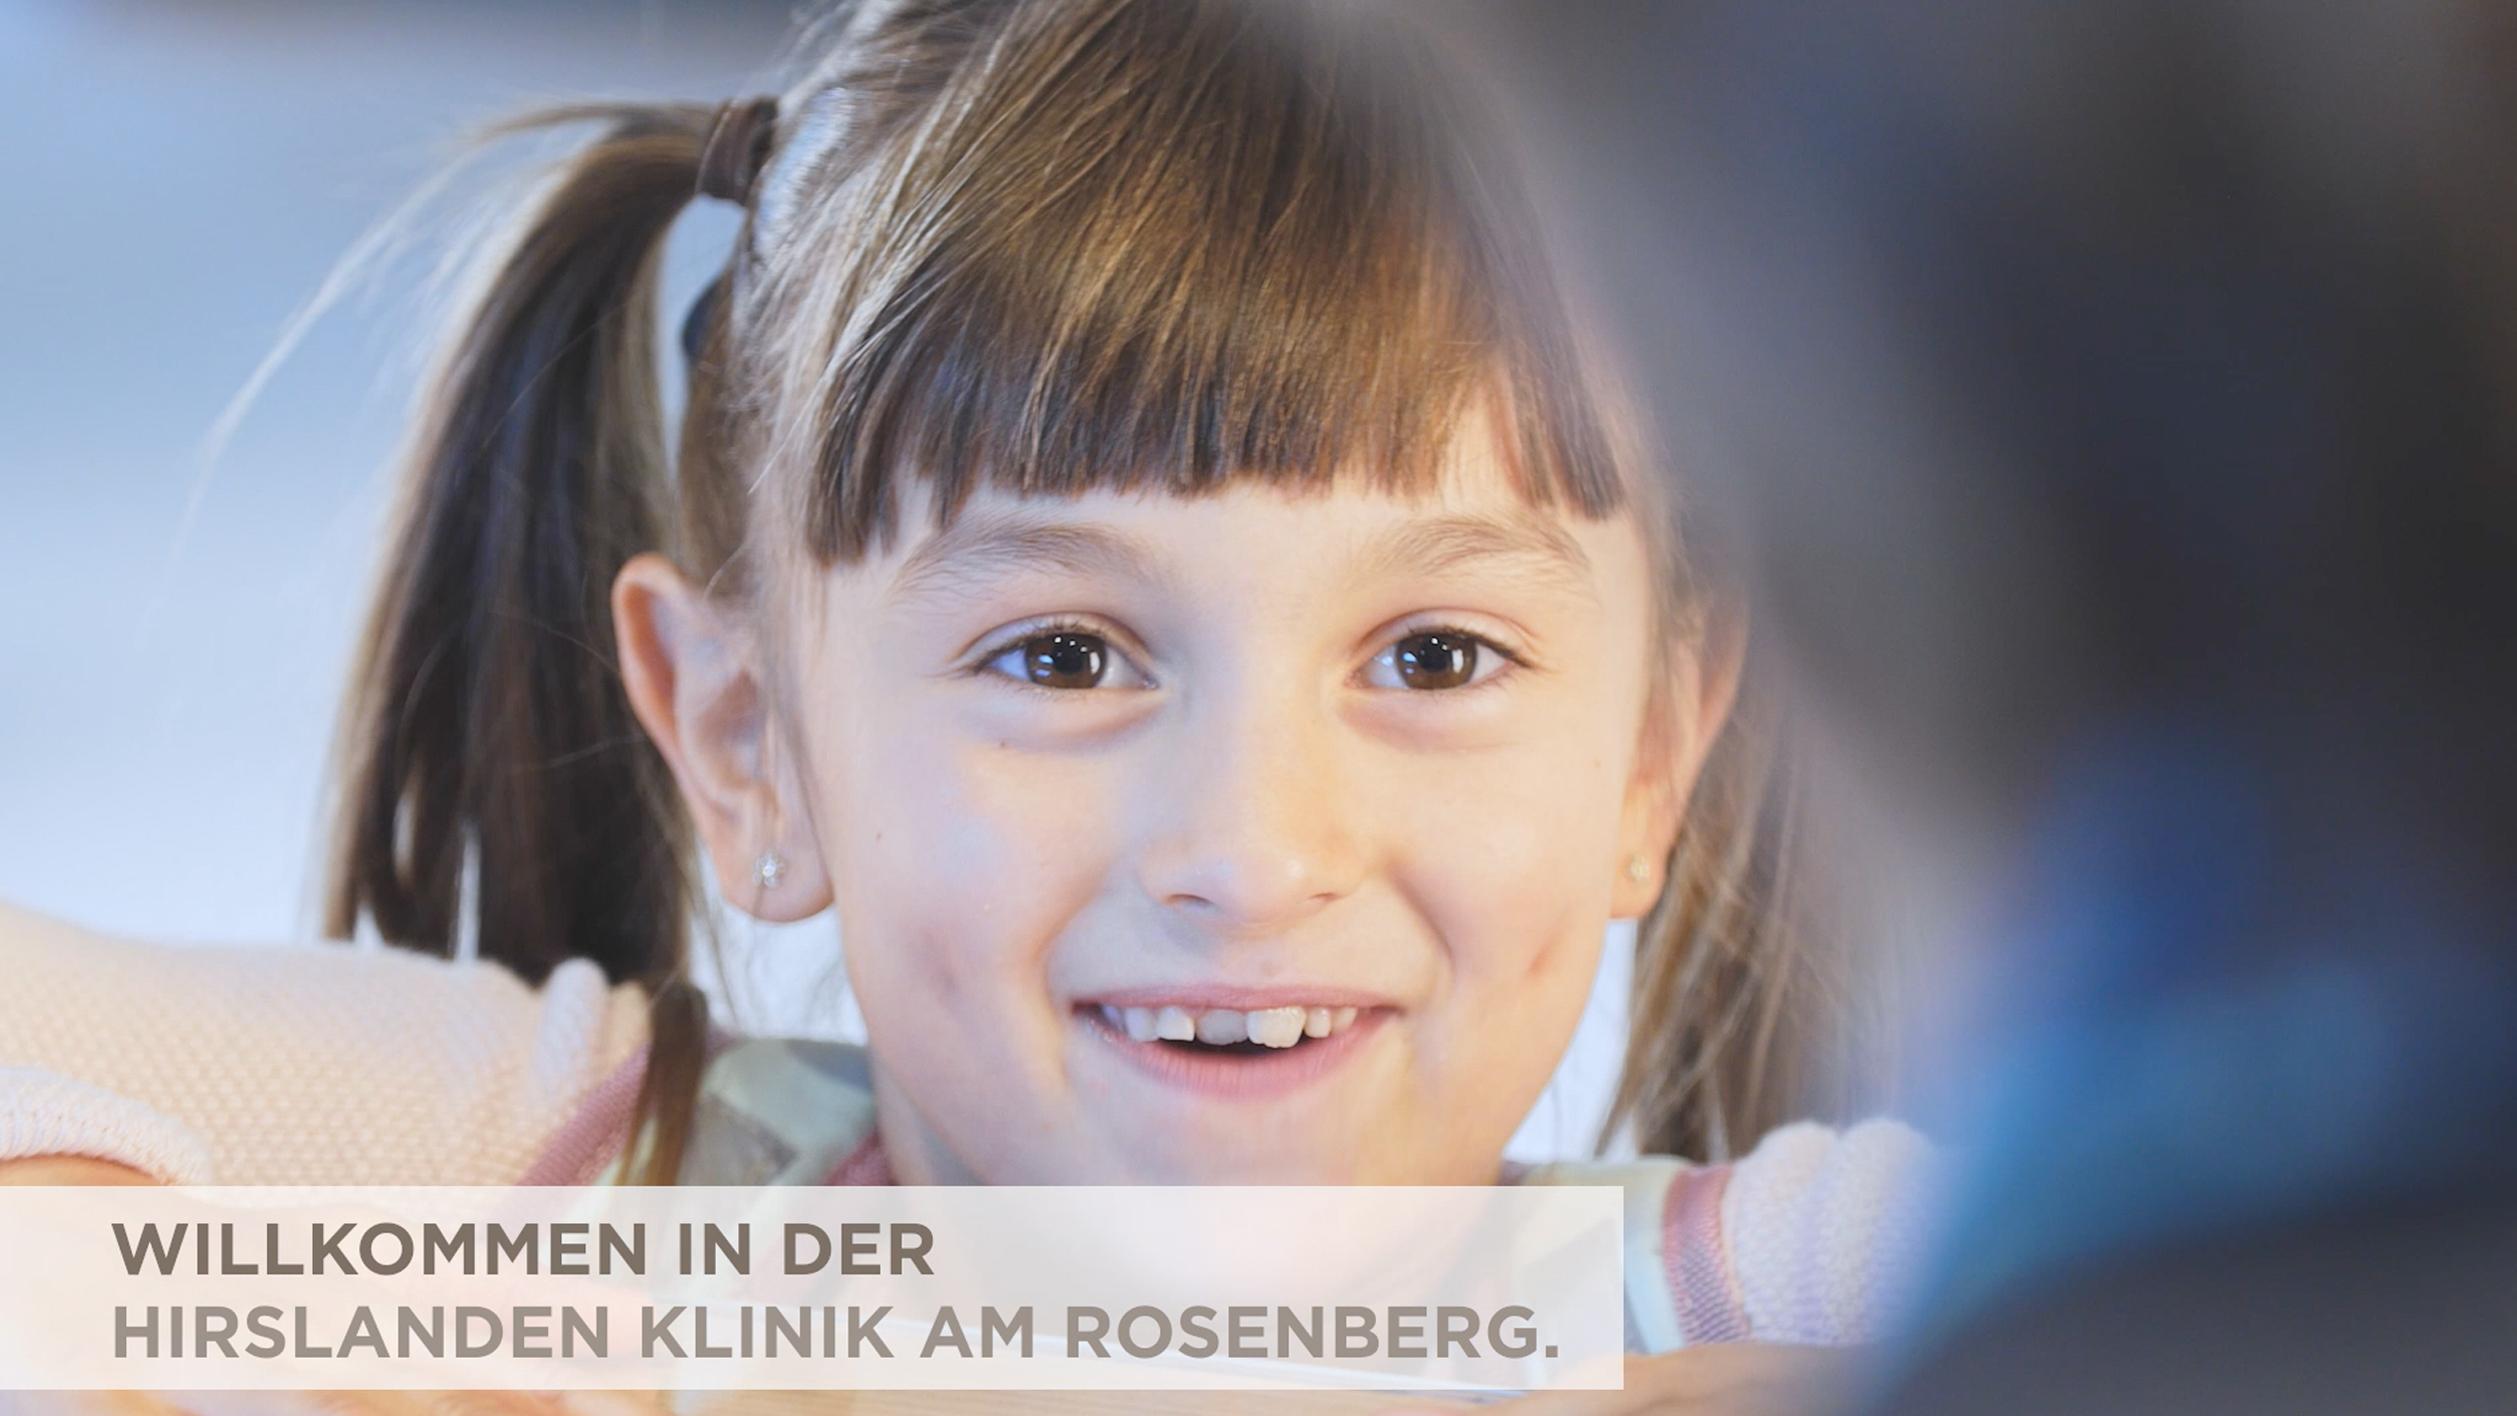 Imagefilm Produktion Hirslanden Klinik Am Rosenberg